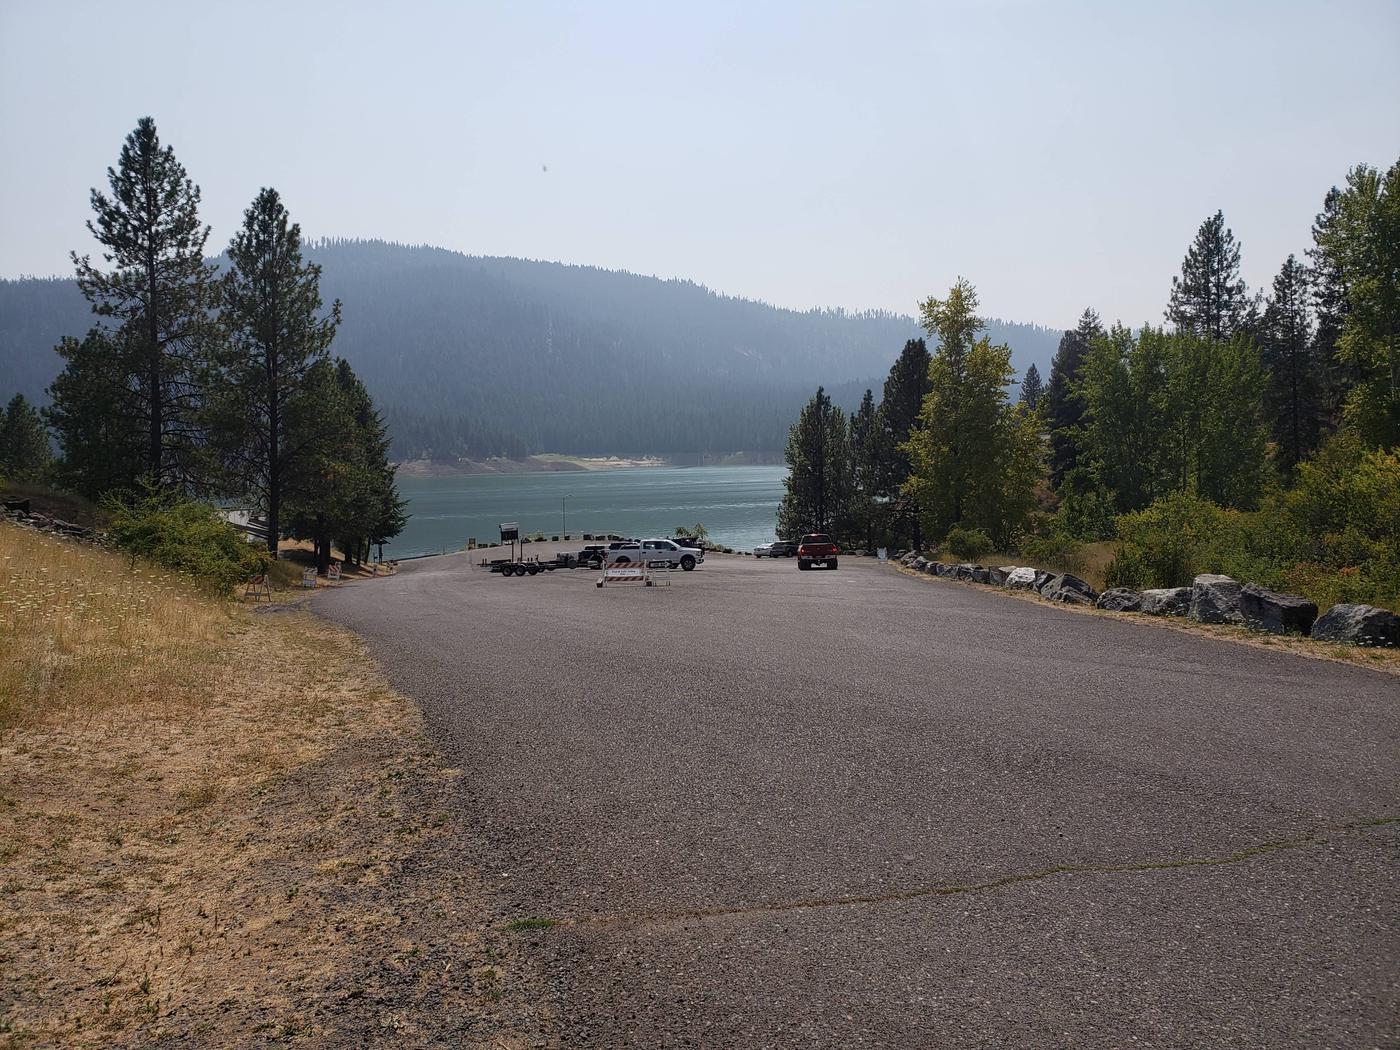 Boat Ramp/ Parking lot